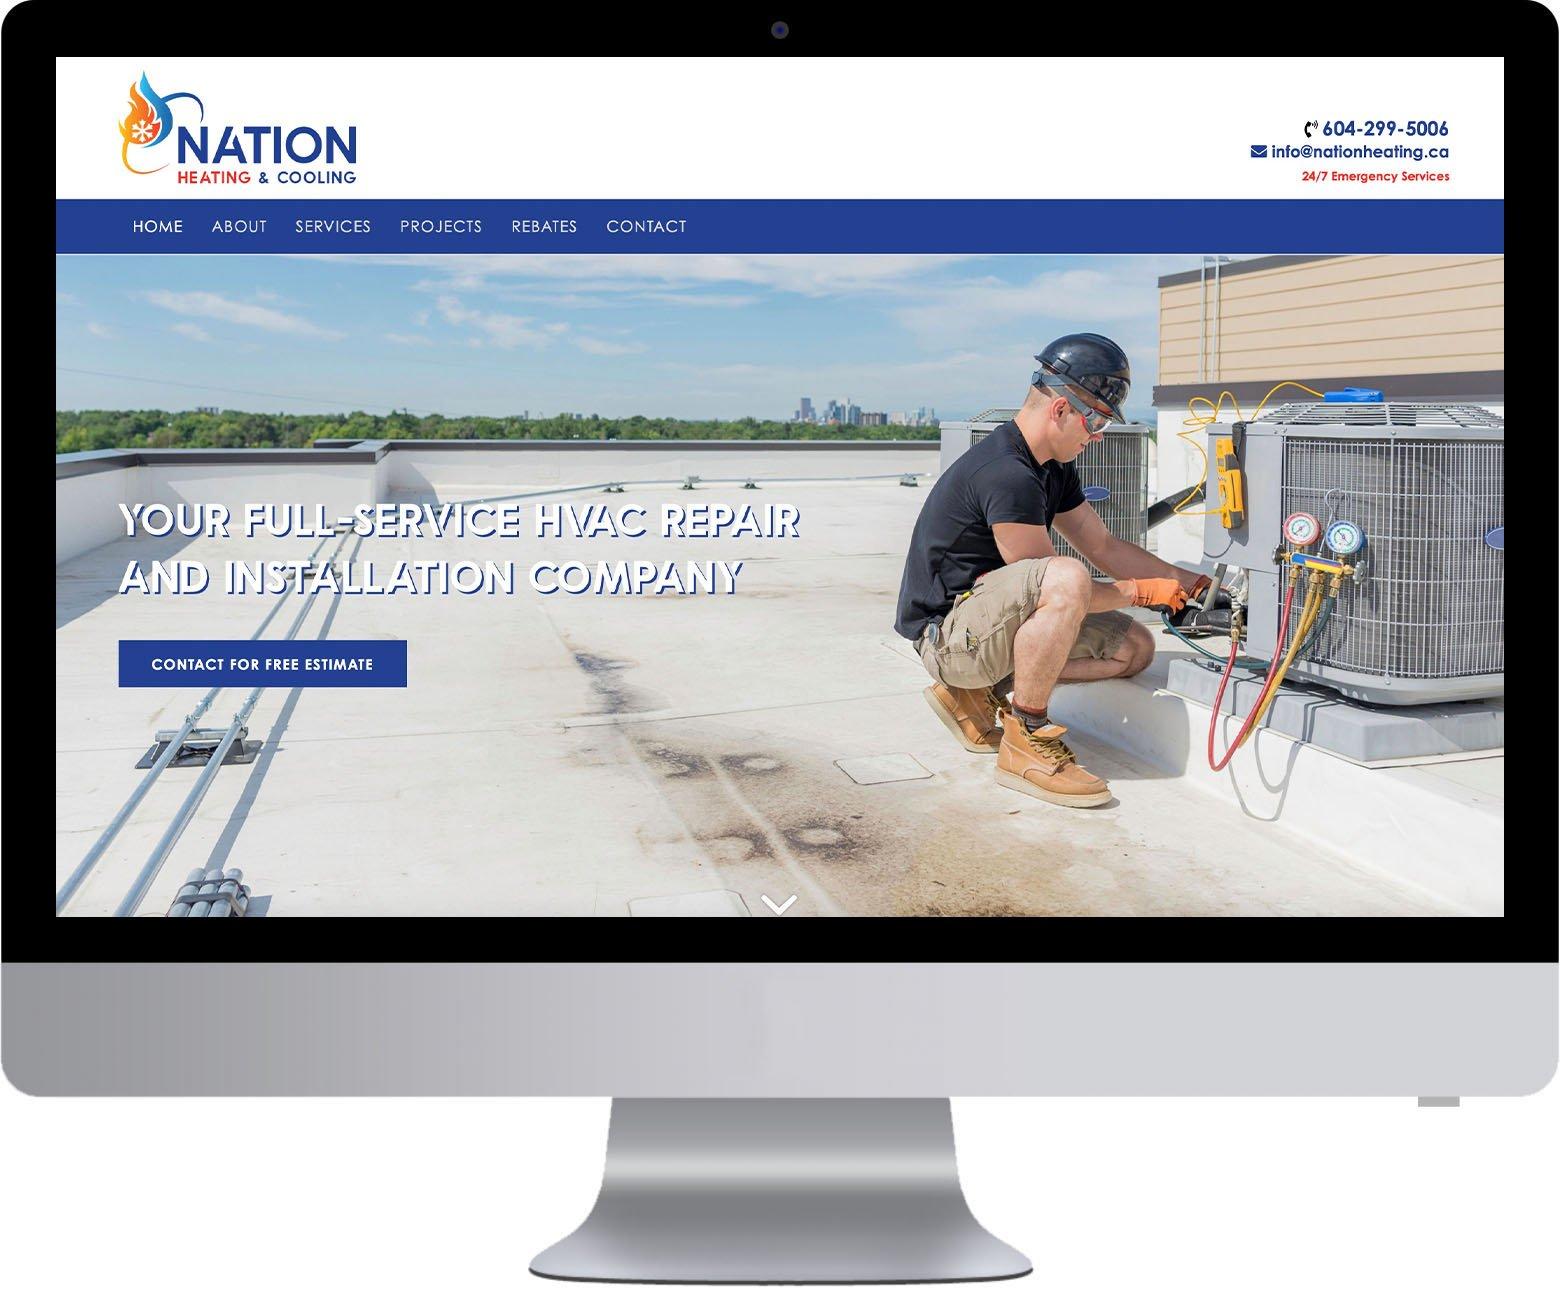 Vancouver WordPress Website Development - Nation Heating